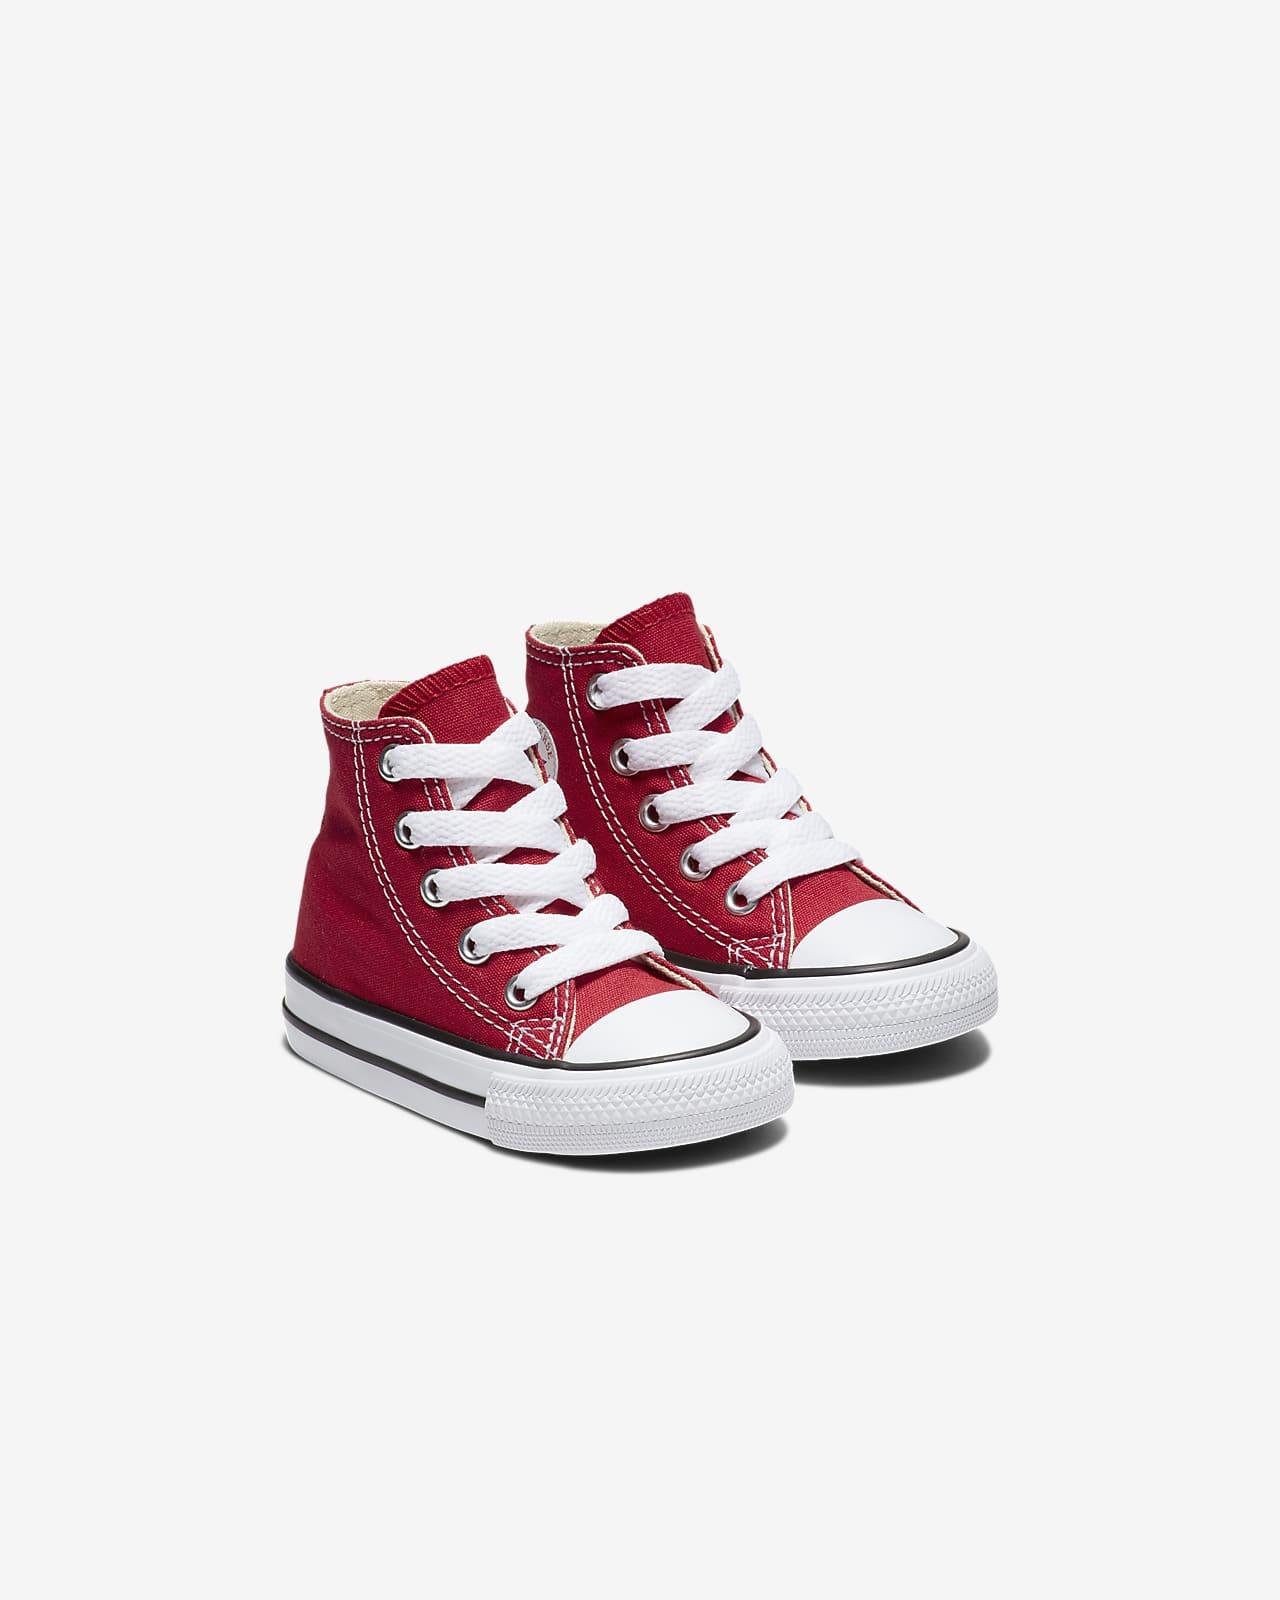 Converse Chuck Taylor All Star High Top (2c 10c) InfantToddler Shoe